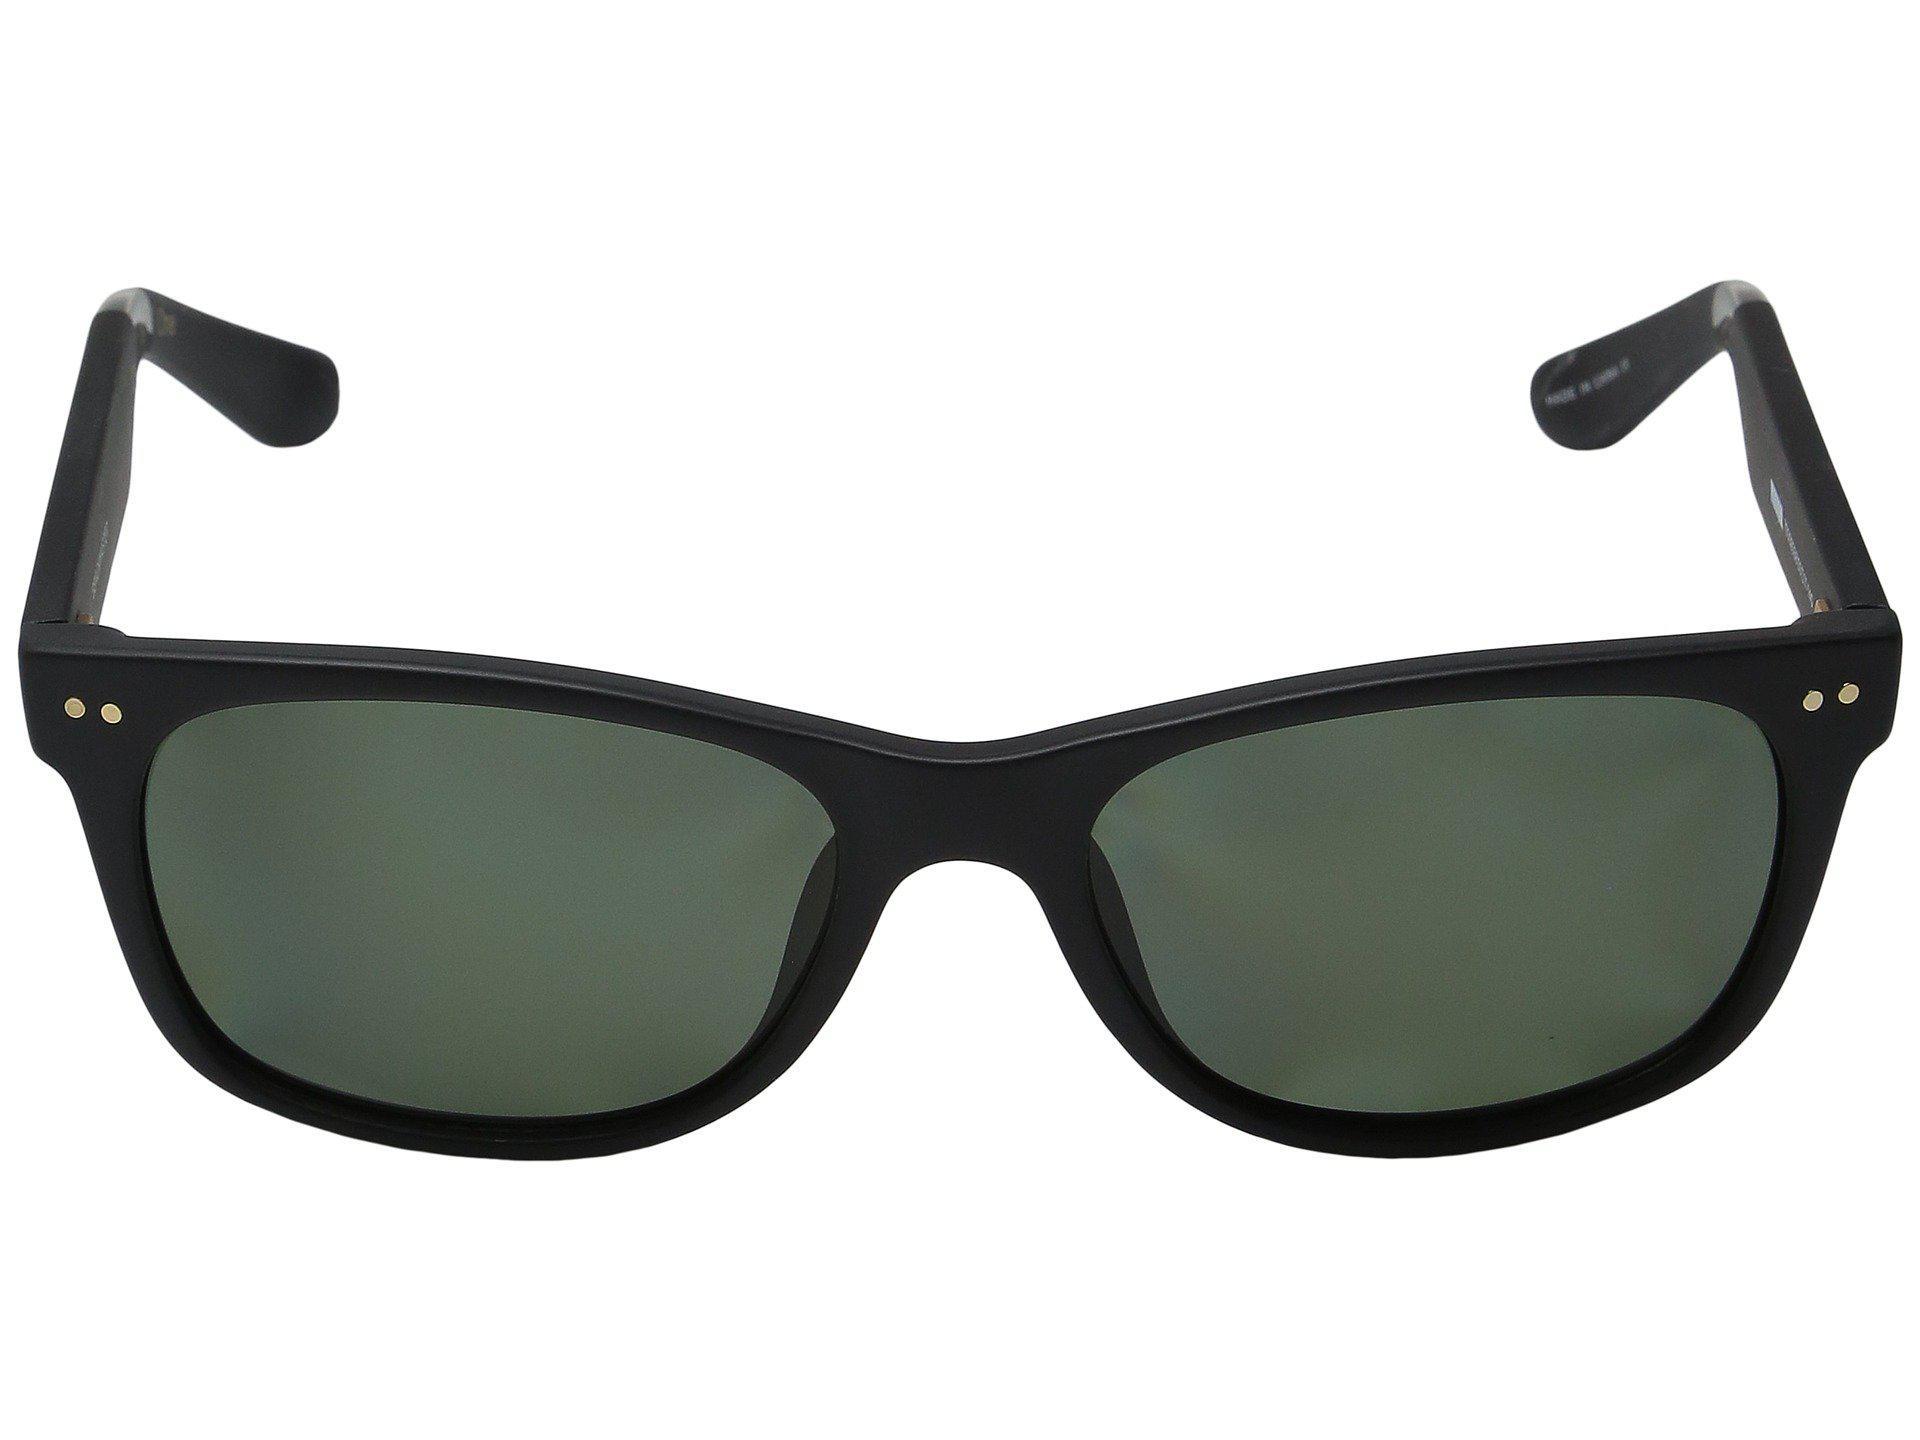 e31813a57a0 TOMS - Black Beachmaster Polarized (matte Tortoise) Fashion Sunglasses -  Lyst. View fullscreen